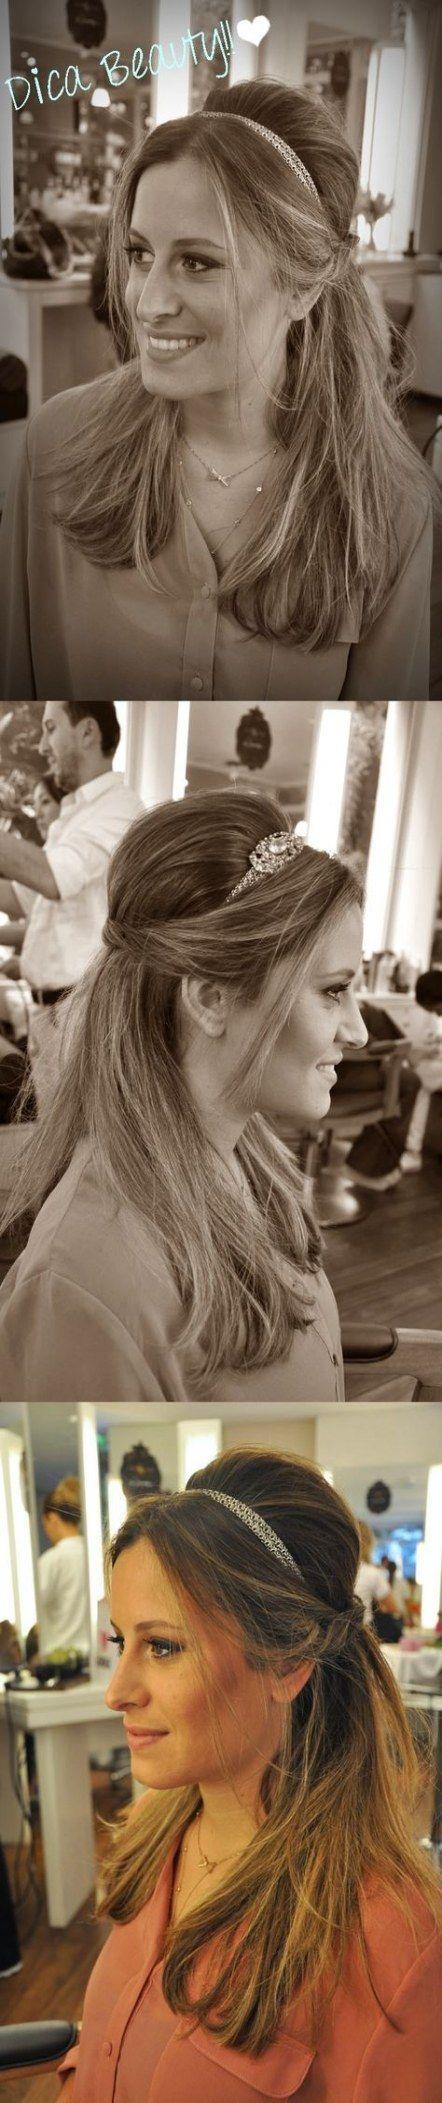 35 Trendy Wedding Hairstyles with Headband Messy Buns, #Buns #Wedding Hairstyles #Messy #with